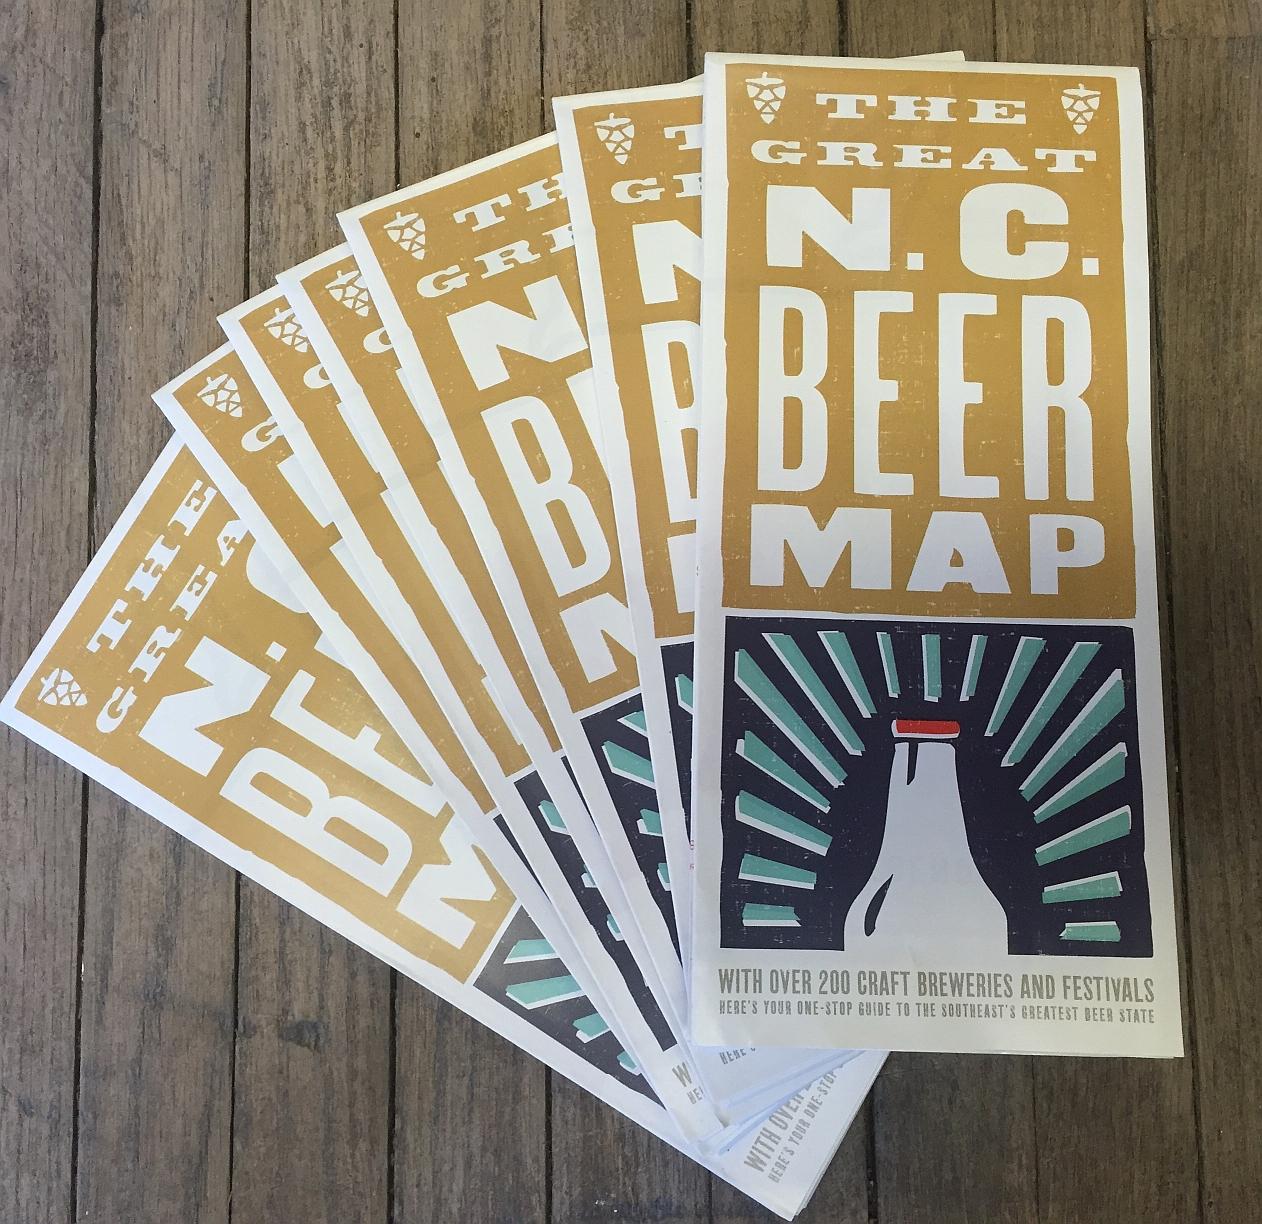 The Great NC Beer Map - Design Archivesu2122 Emporium: Greensboro and Winston-Salem